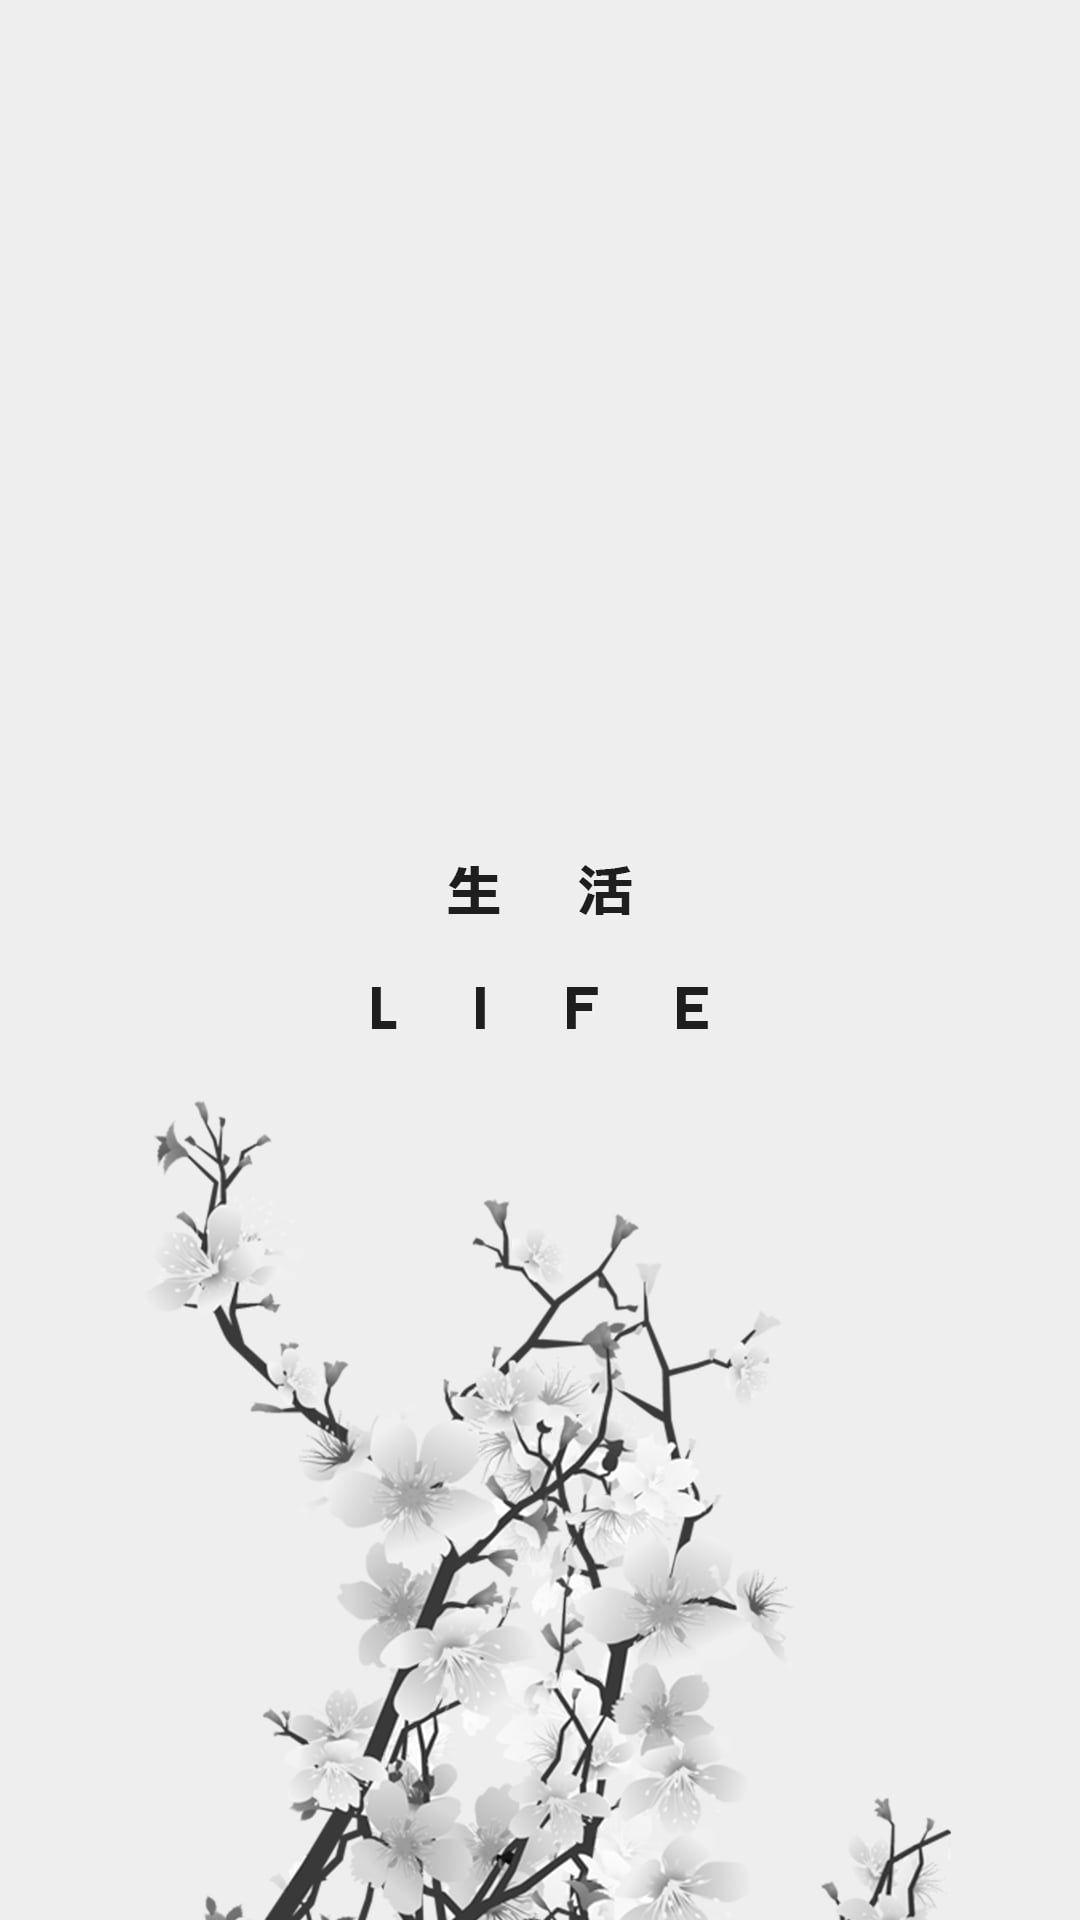 Black Life Text Life Kanji Japan 1080p Wallpaper Hdwallpaper Desktop Words Wallpaper Hd Phone Wallpapers Aesthetic Iphone Wallpaper